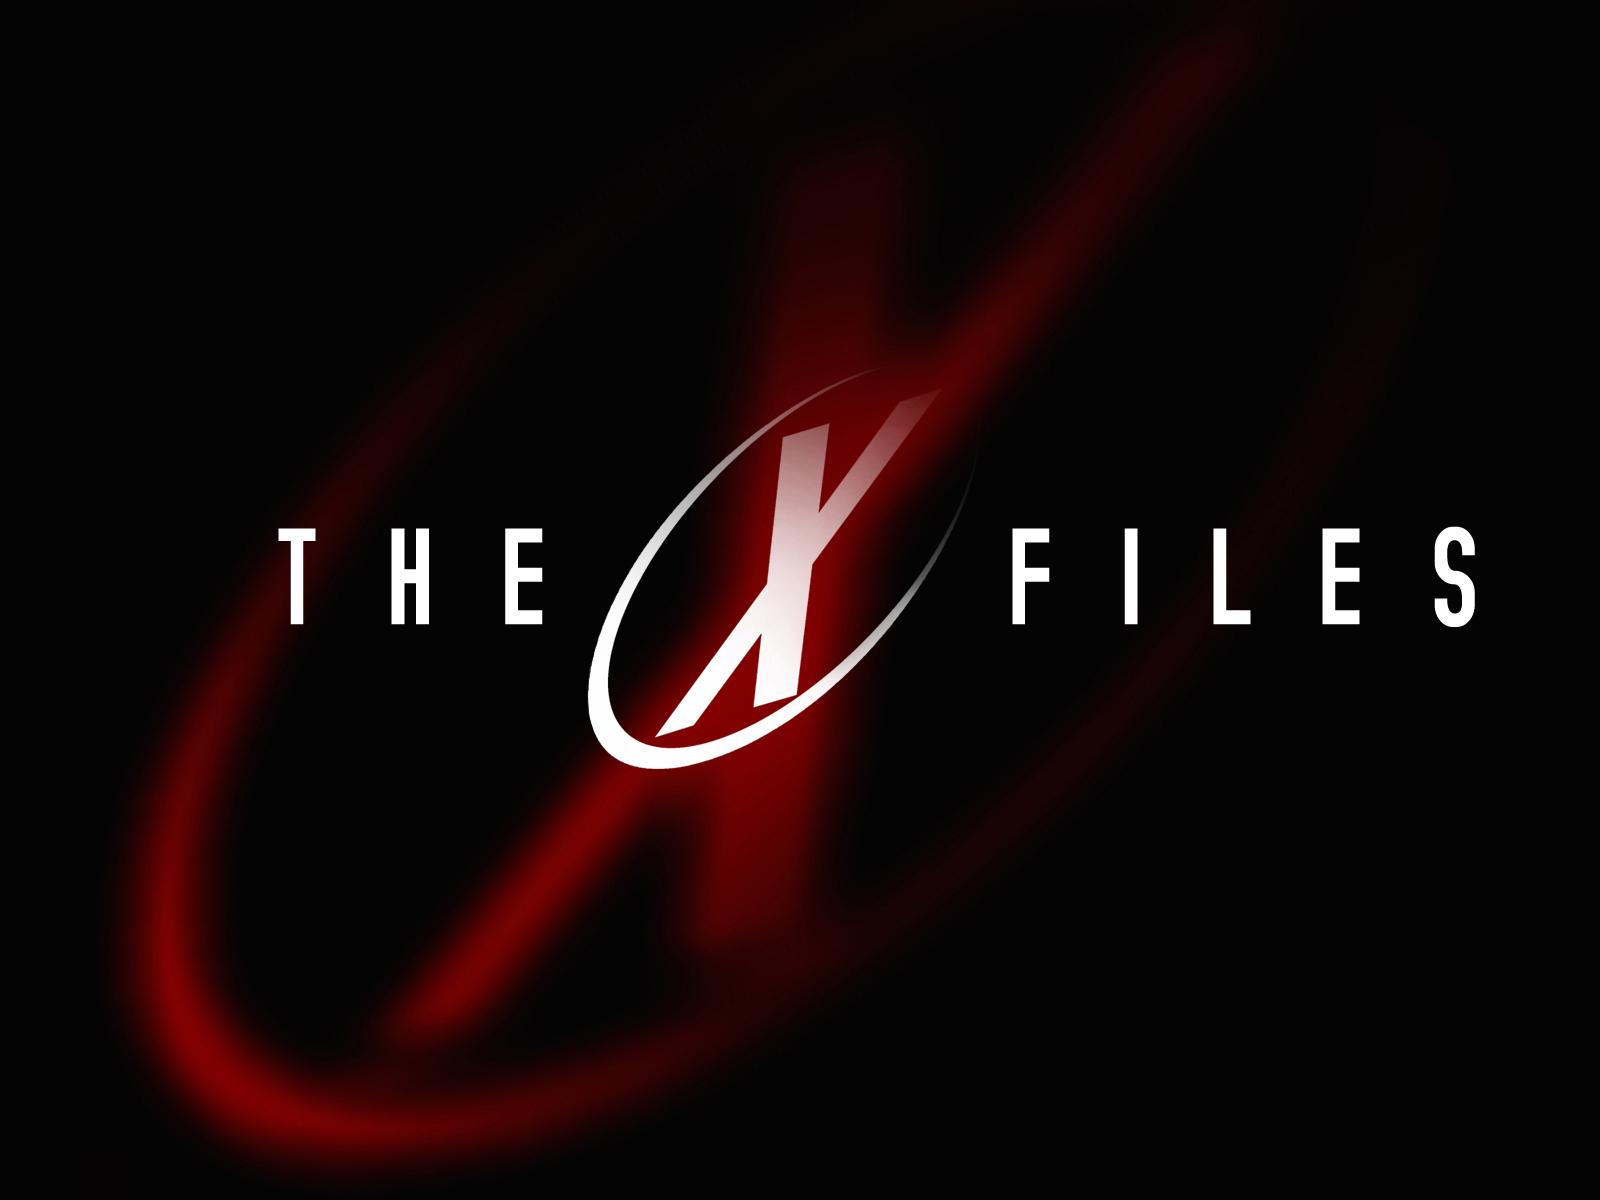 X Files wallpaper 218784 1600x1200